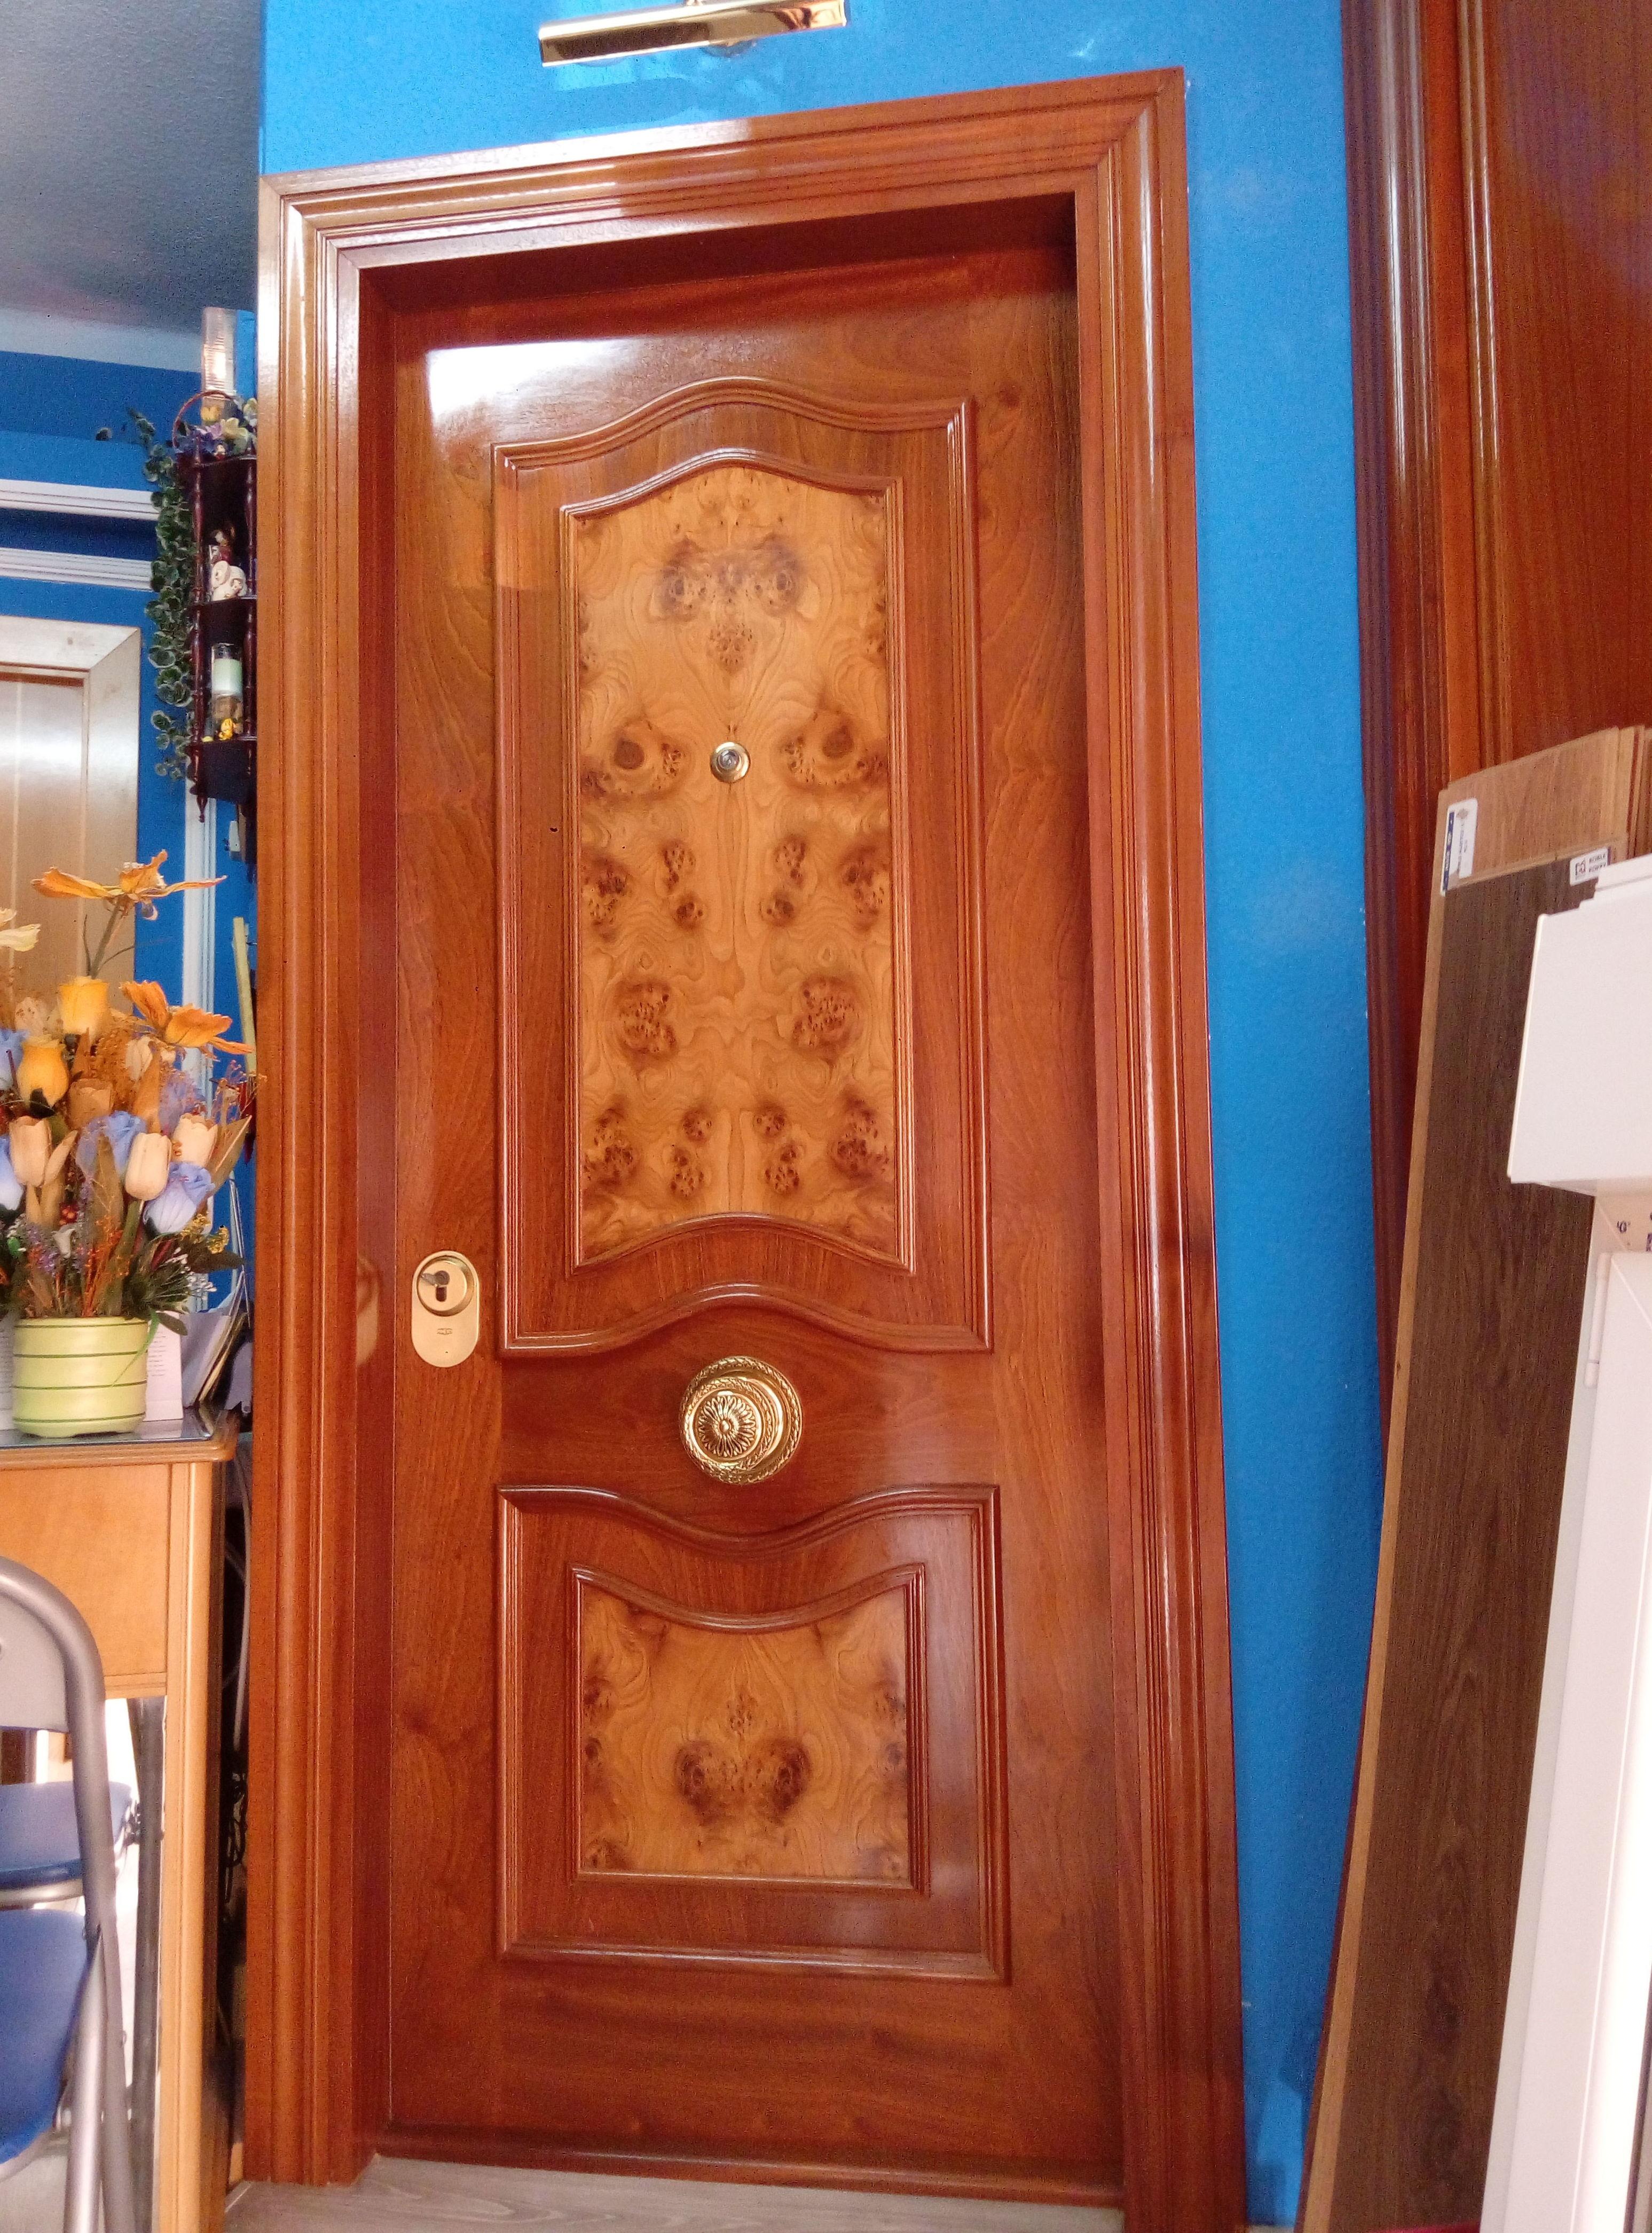 Exposición puertas de maderas en aviles